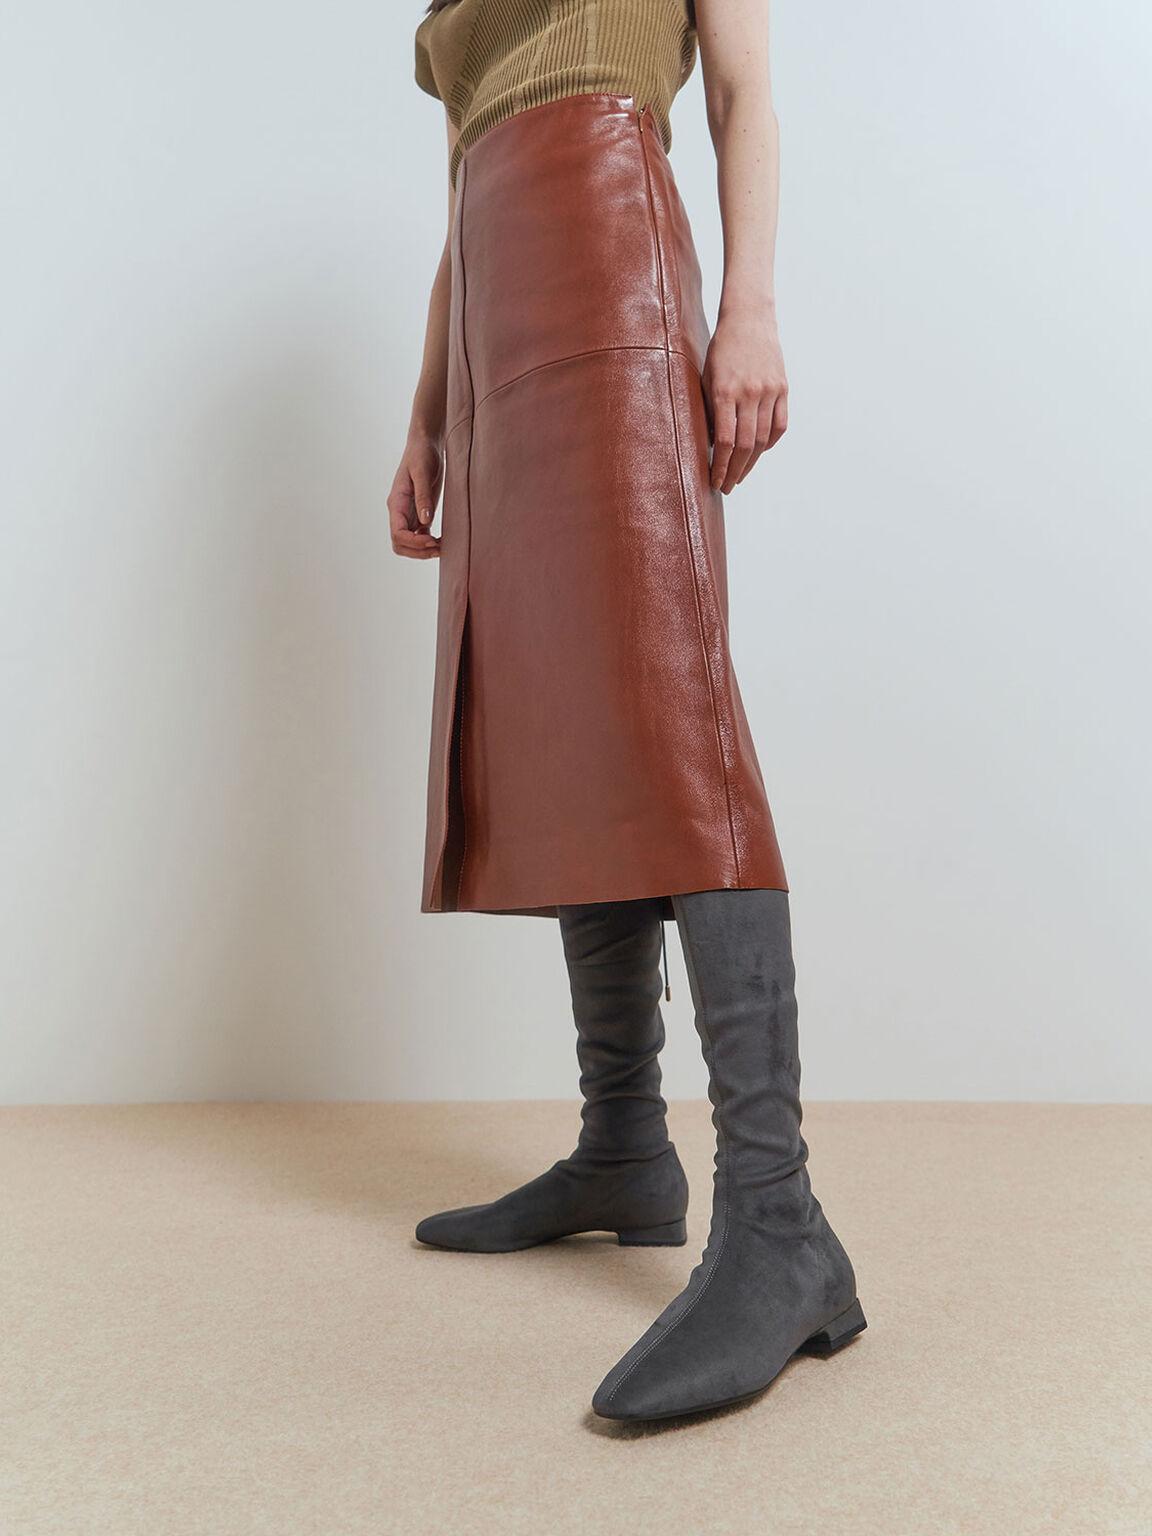 Textured Thigh High Boots, Dark Grey, hi-res